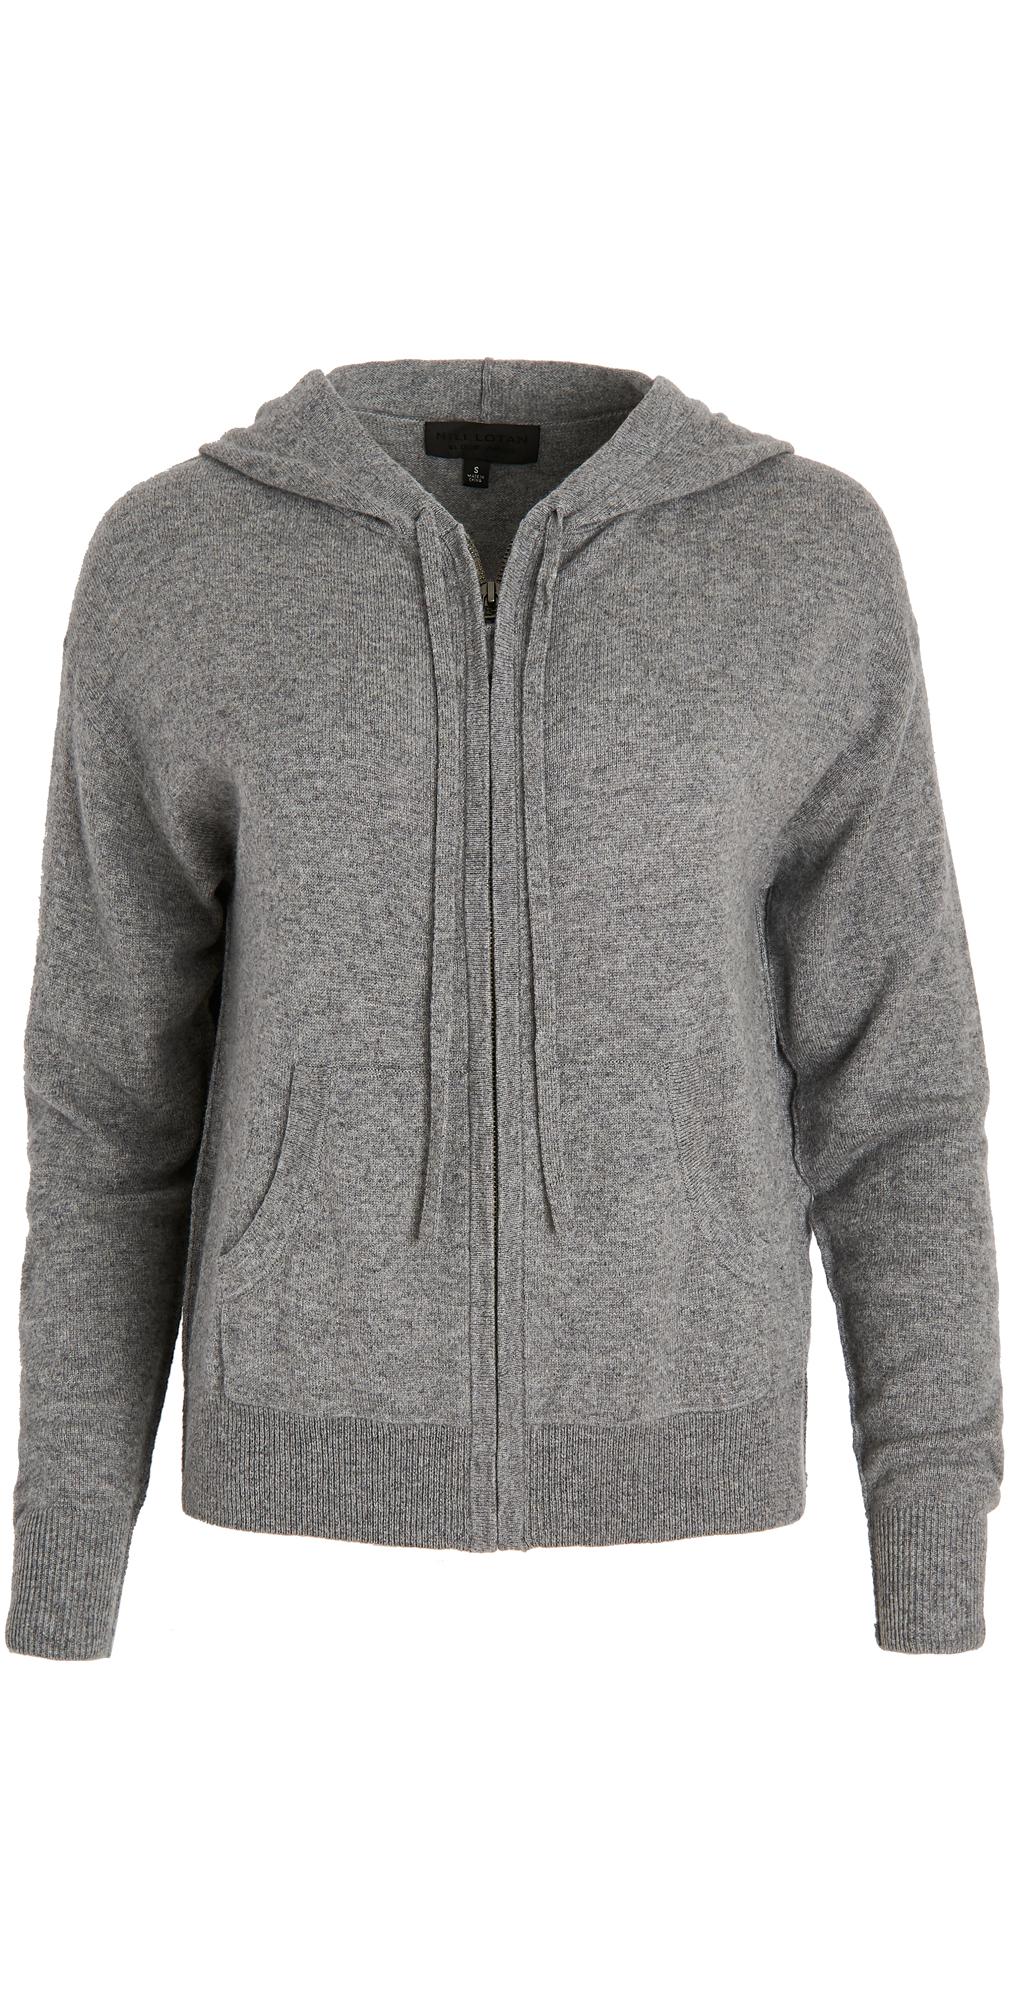 Nili Lotan Emmaline Cashmere Sweater